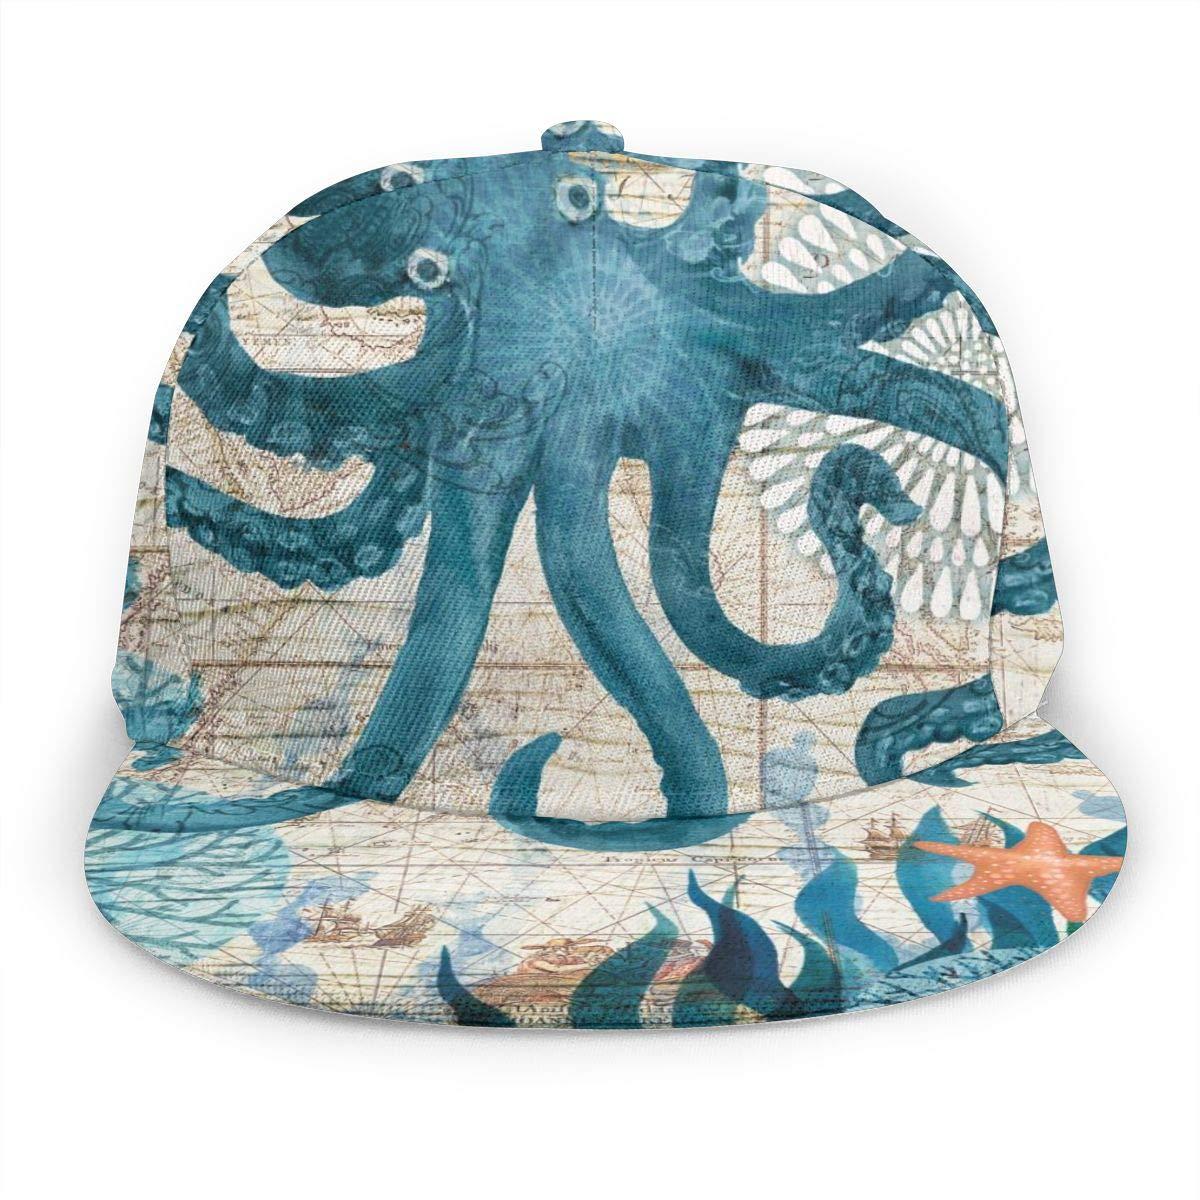 Sea World Octopus Womens Classic Hip Hop Baseball Cap 100/% Cotton Unisex Soft Adjustable Size Black